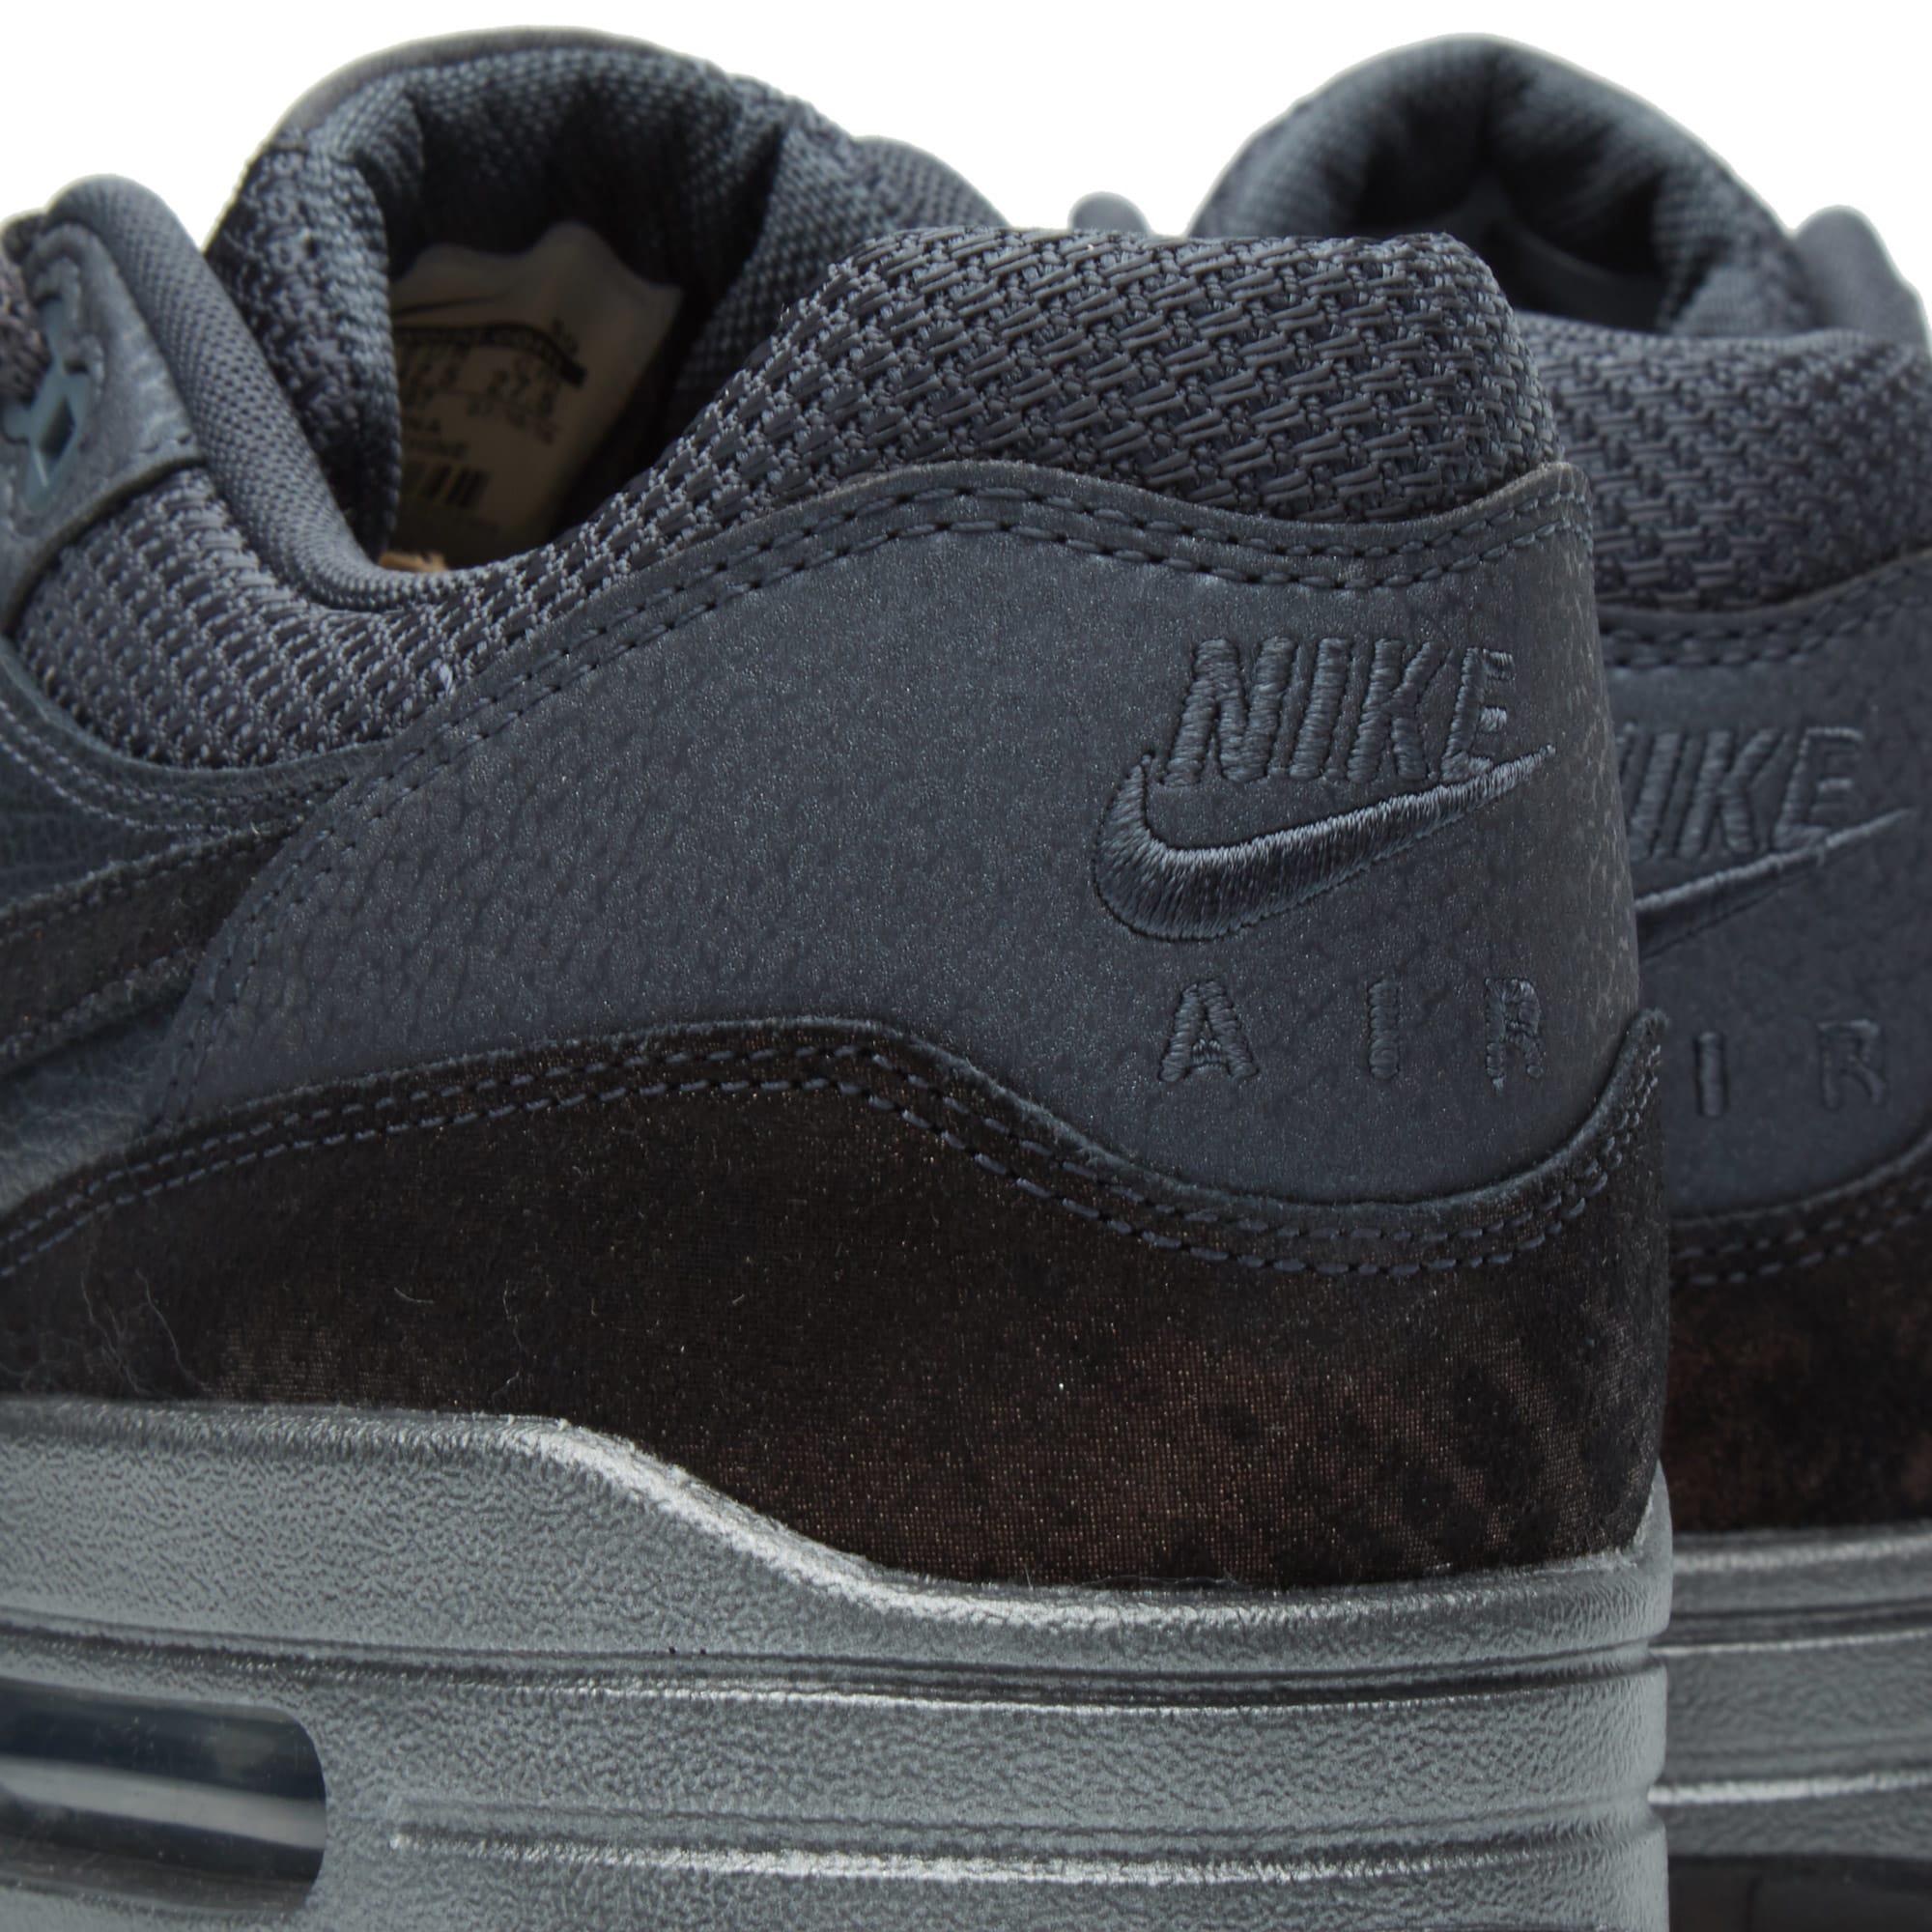 Nike Air Max 1 Premium BlackMetallic Hematite Black 454746